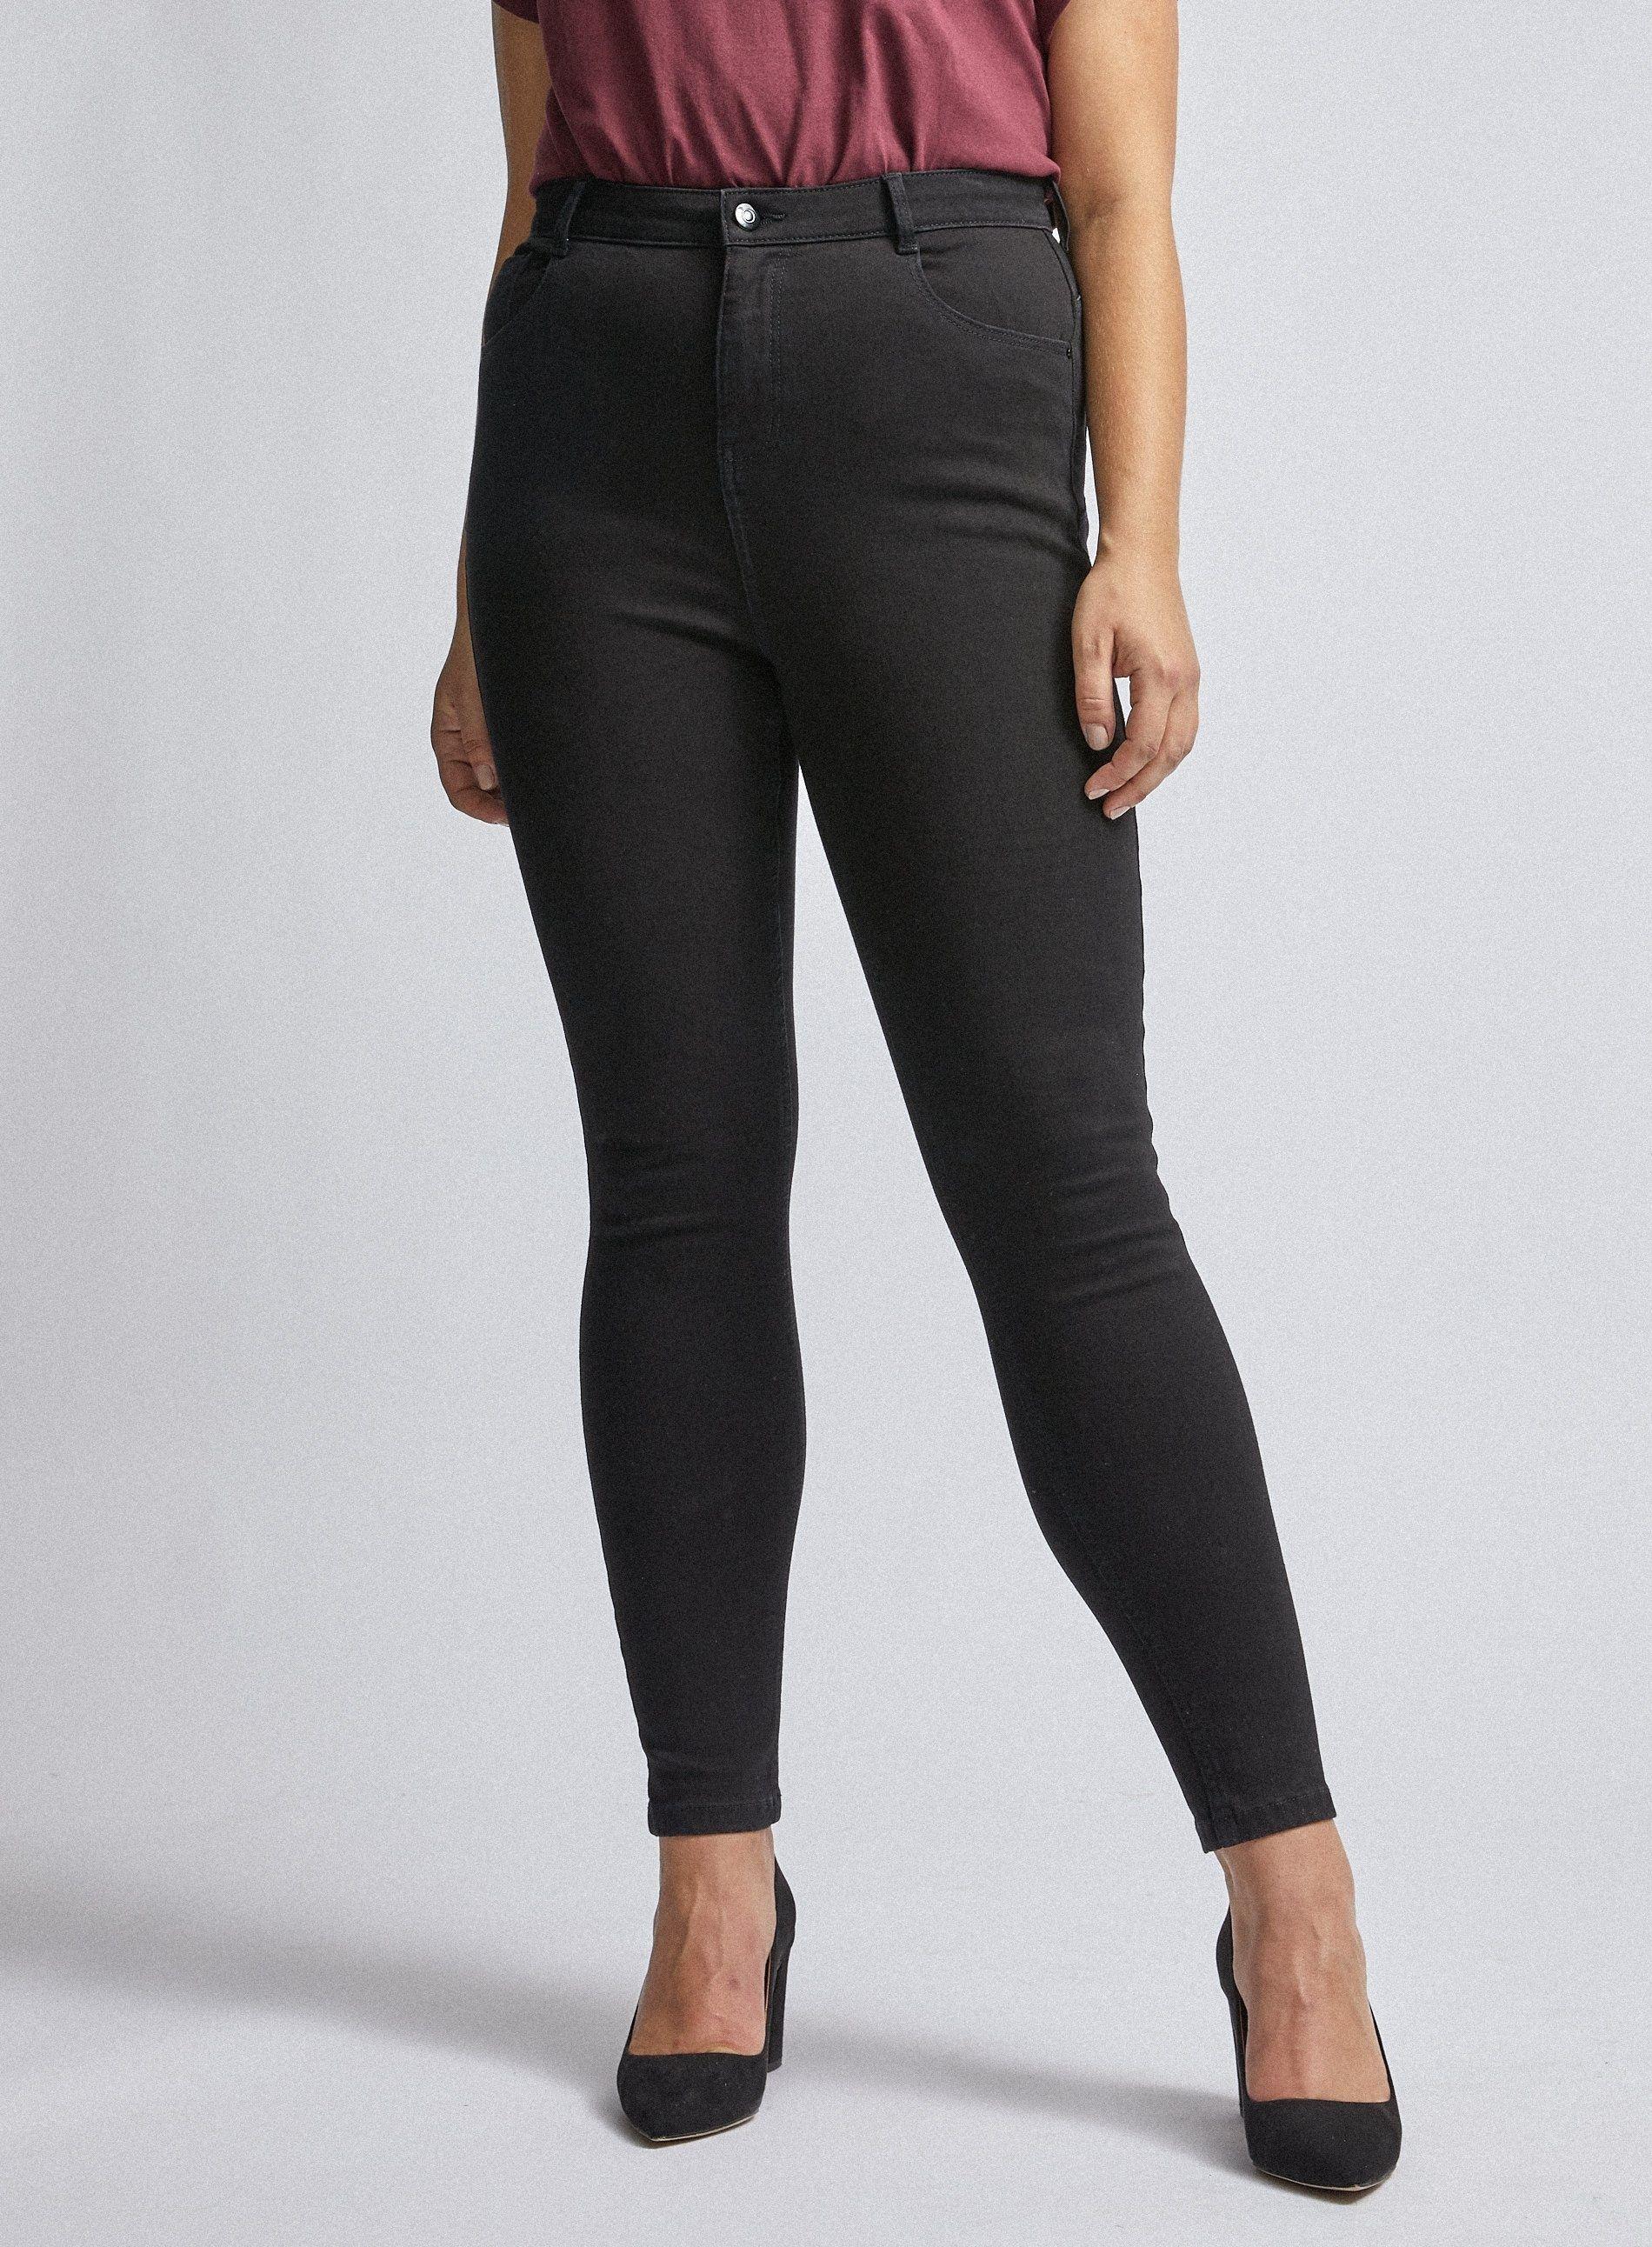 Dorothy Perkins Womens Curve Black Shape & Lift 4Way Denim Skinny Jeans Trousers